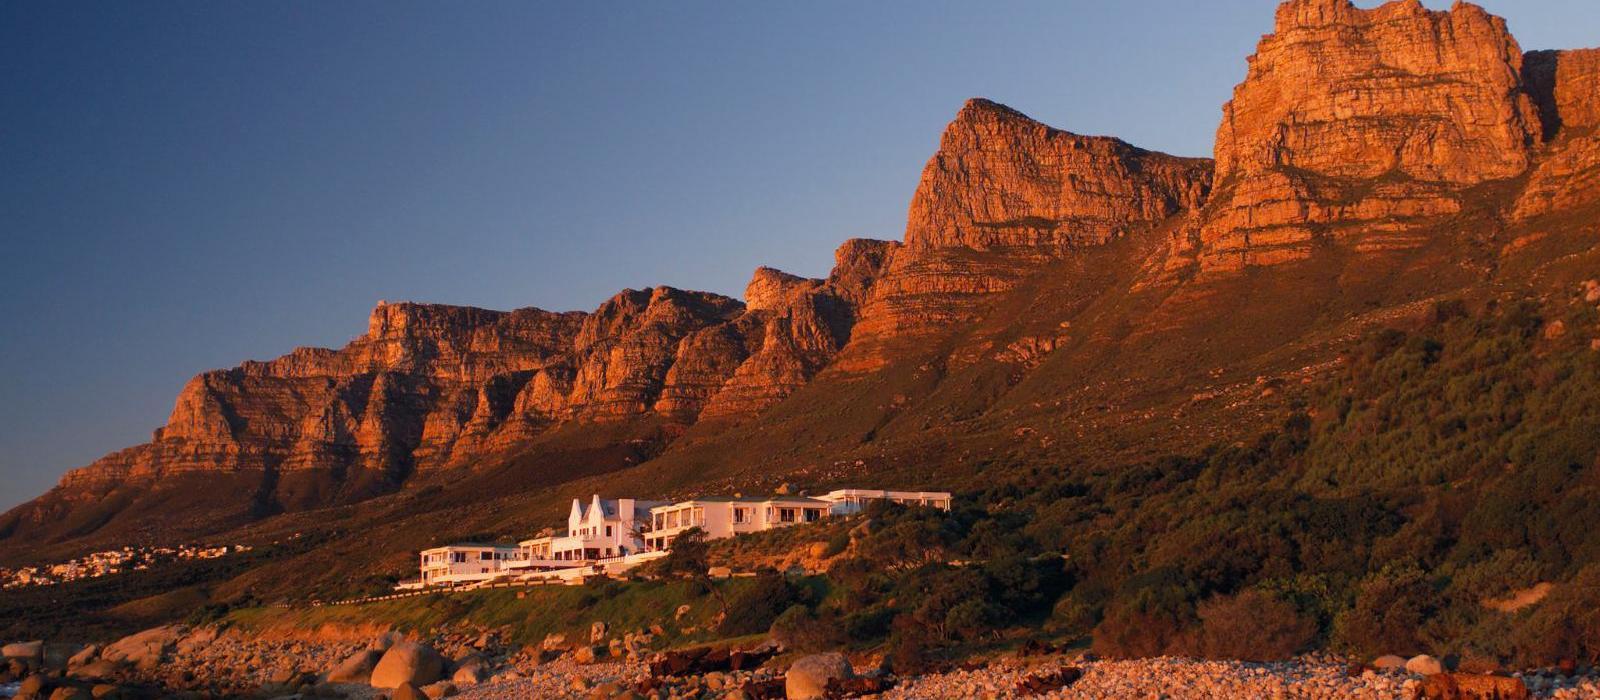 十二使徒水疗酒店(12 Apostles Hotel & Spa) 图片  www.lhw.cn